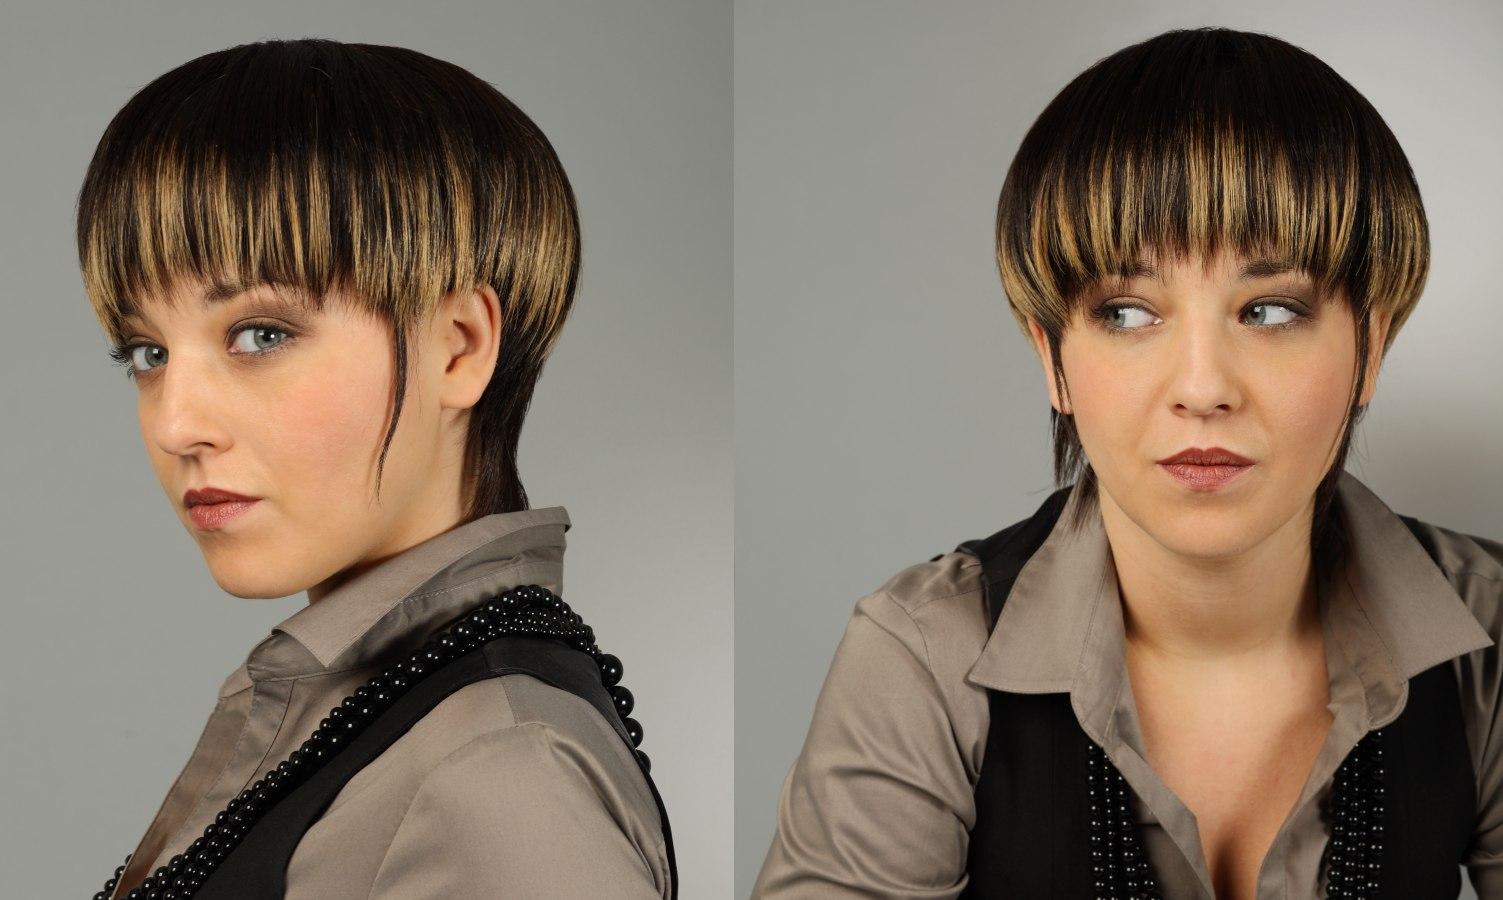 short mushroom haircut with a longer sleek neck section